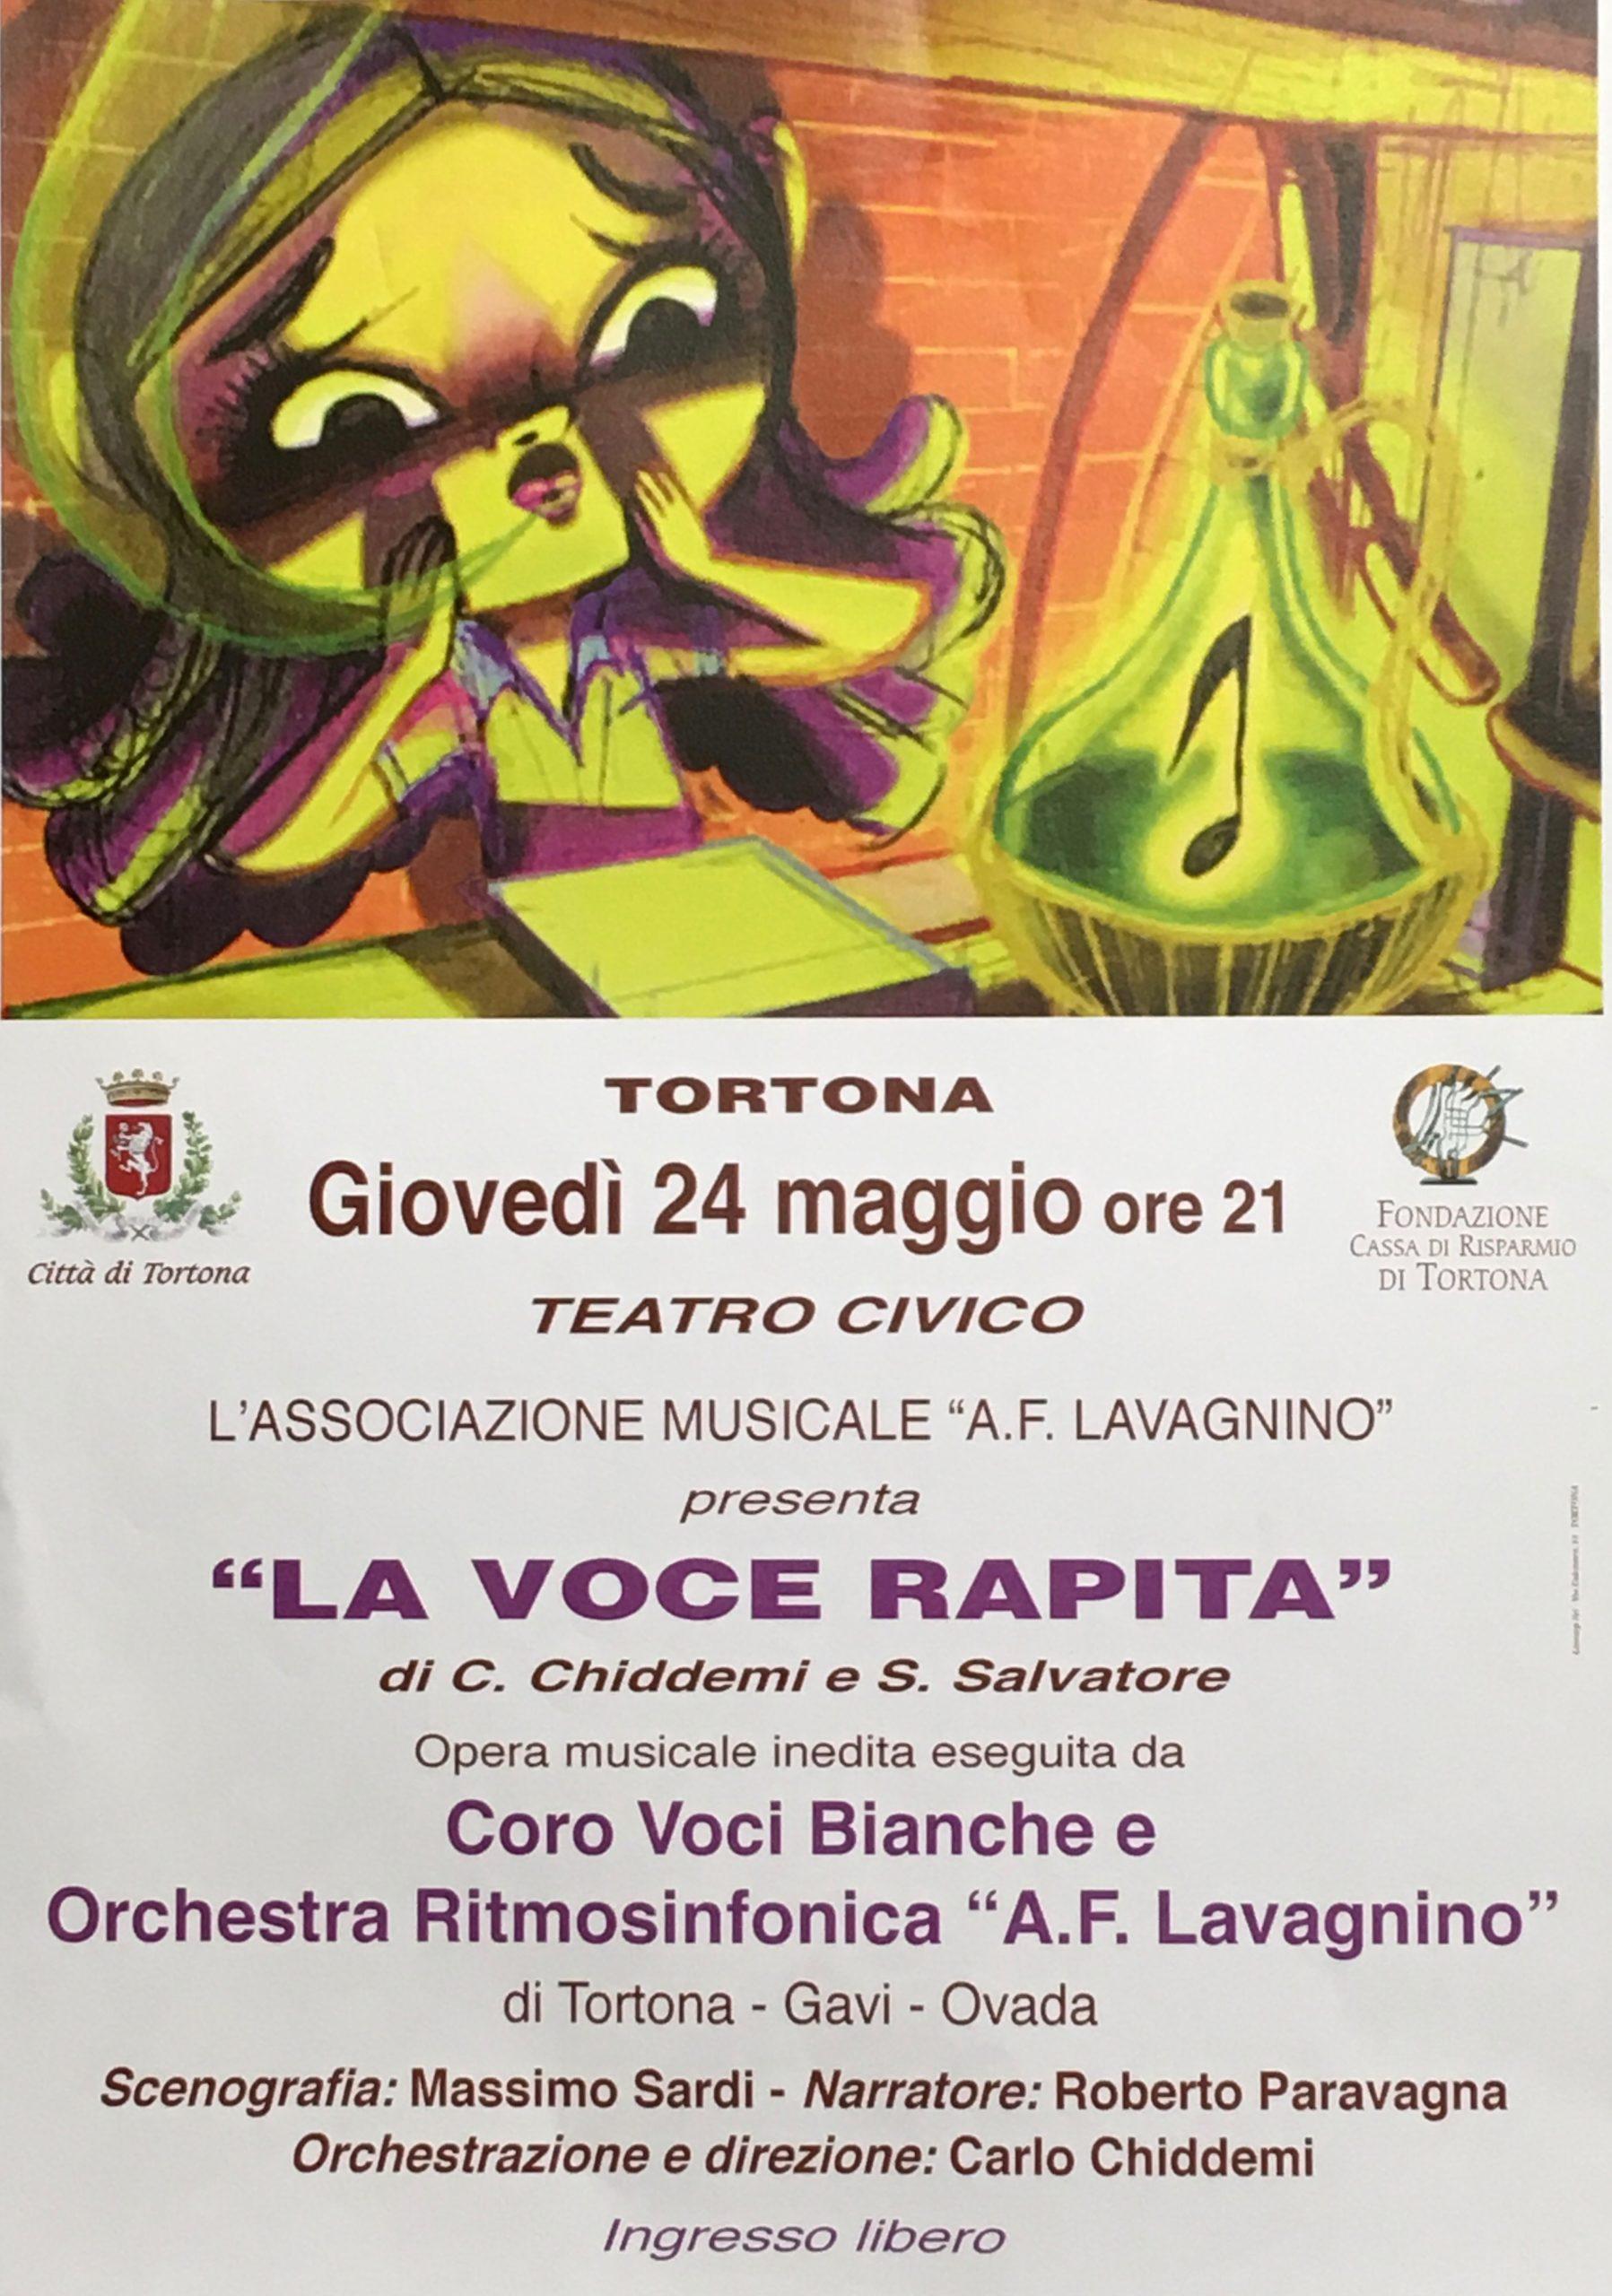 La voce rapita - Teatro Civico Tortona